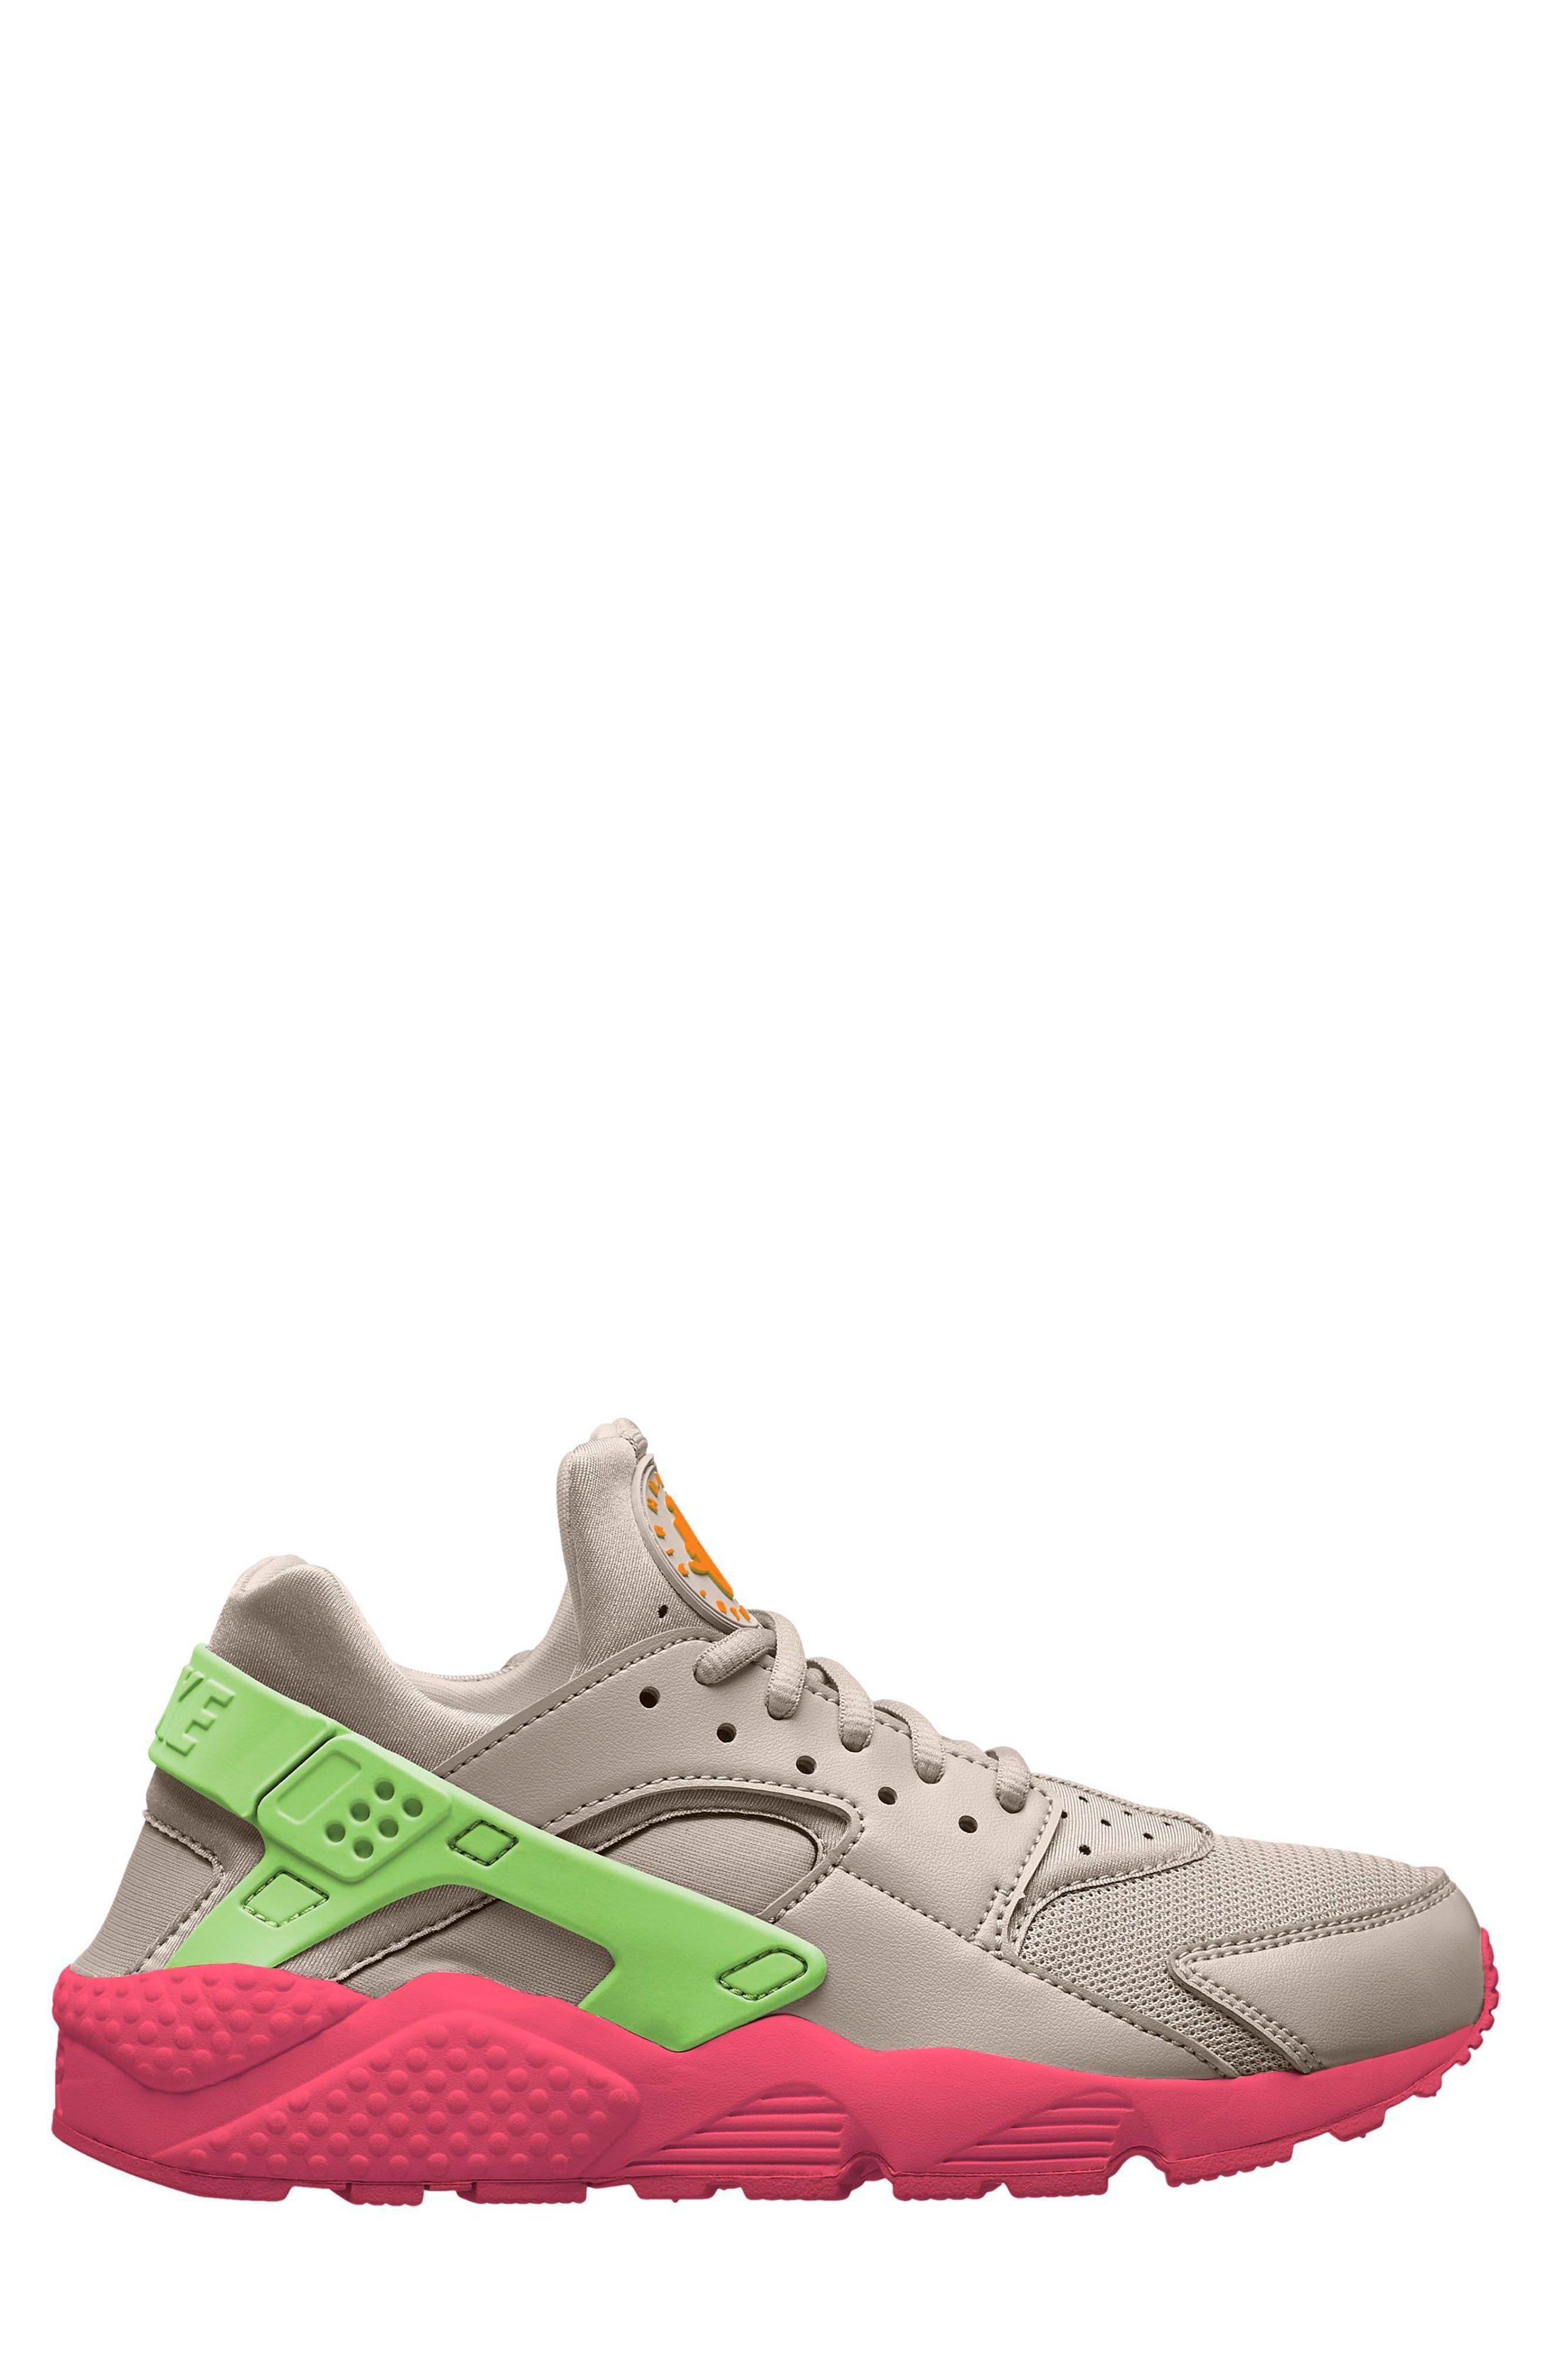 Alternate Image 1 Selected - Nike Air Huarache Run Sneaker (Women)